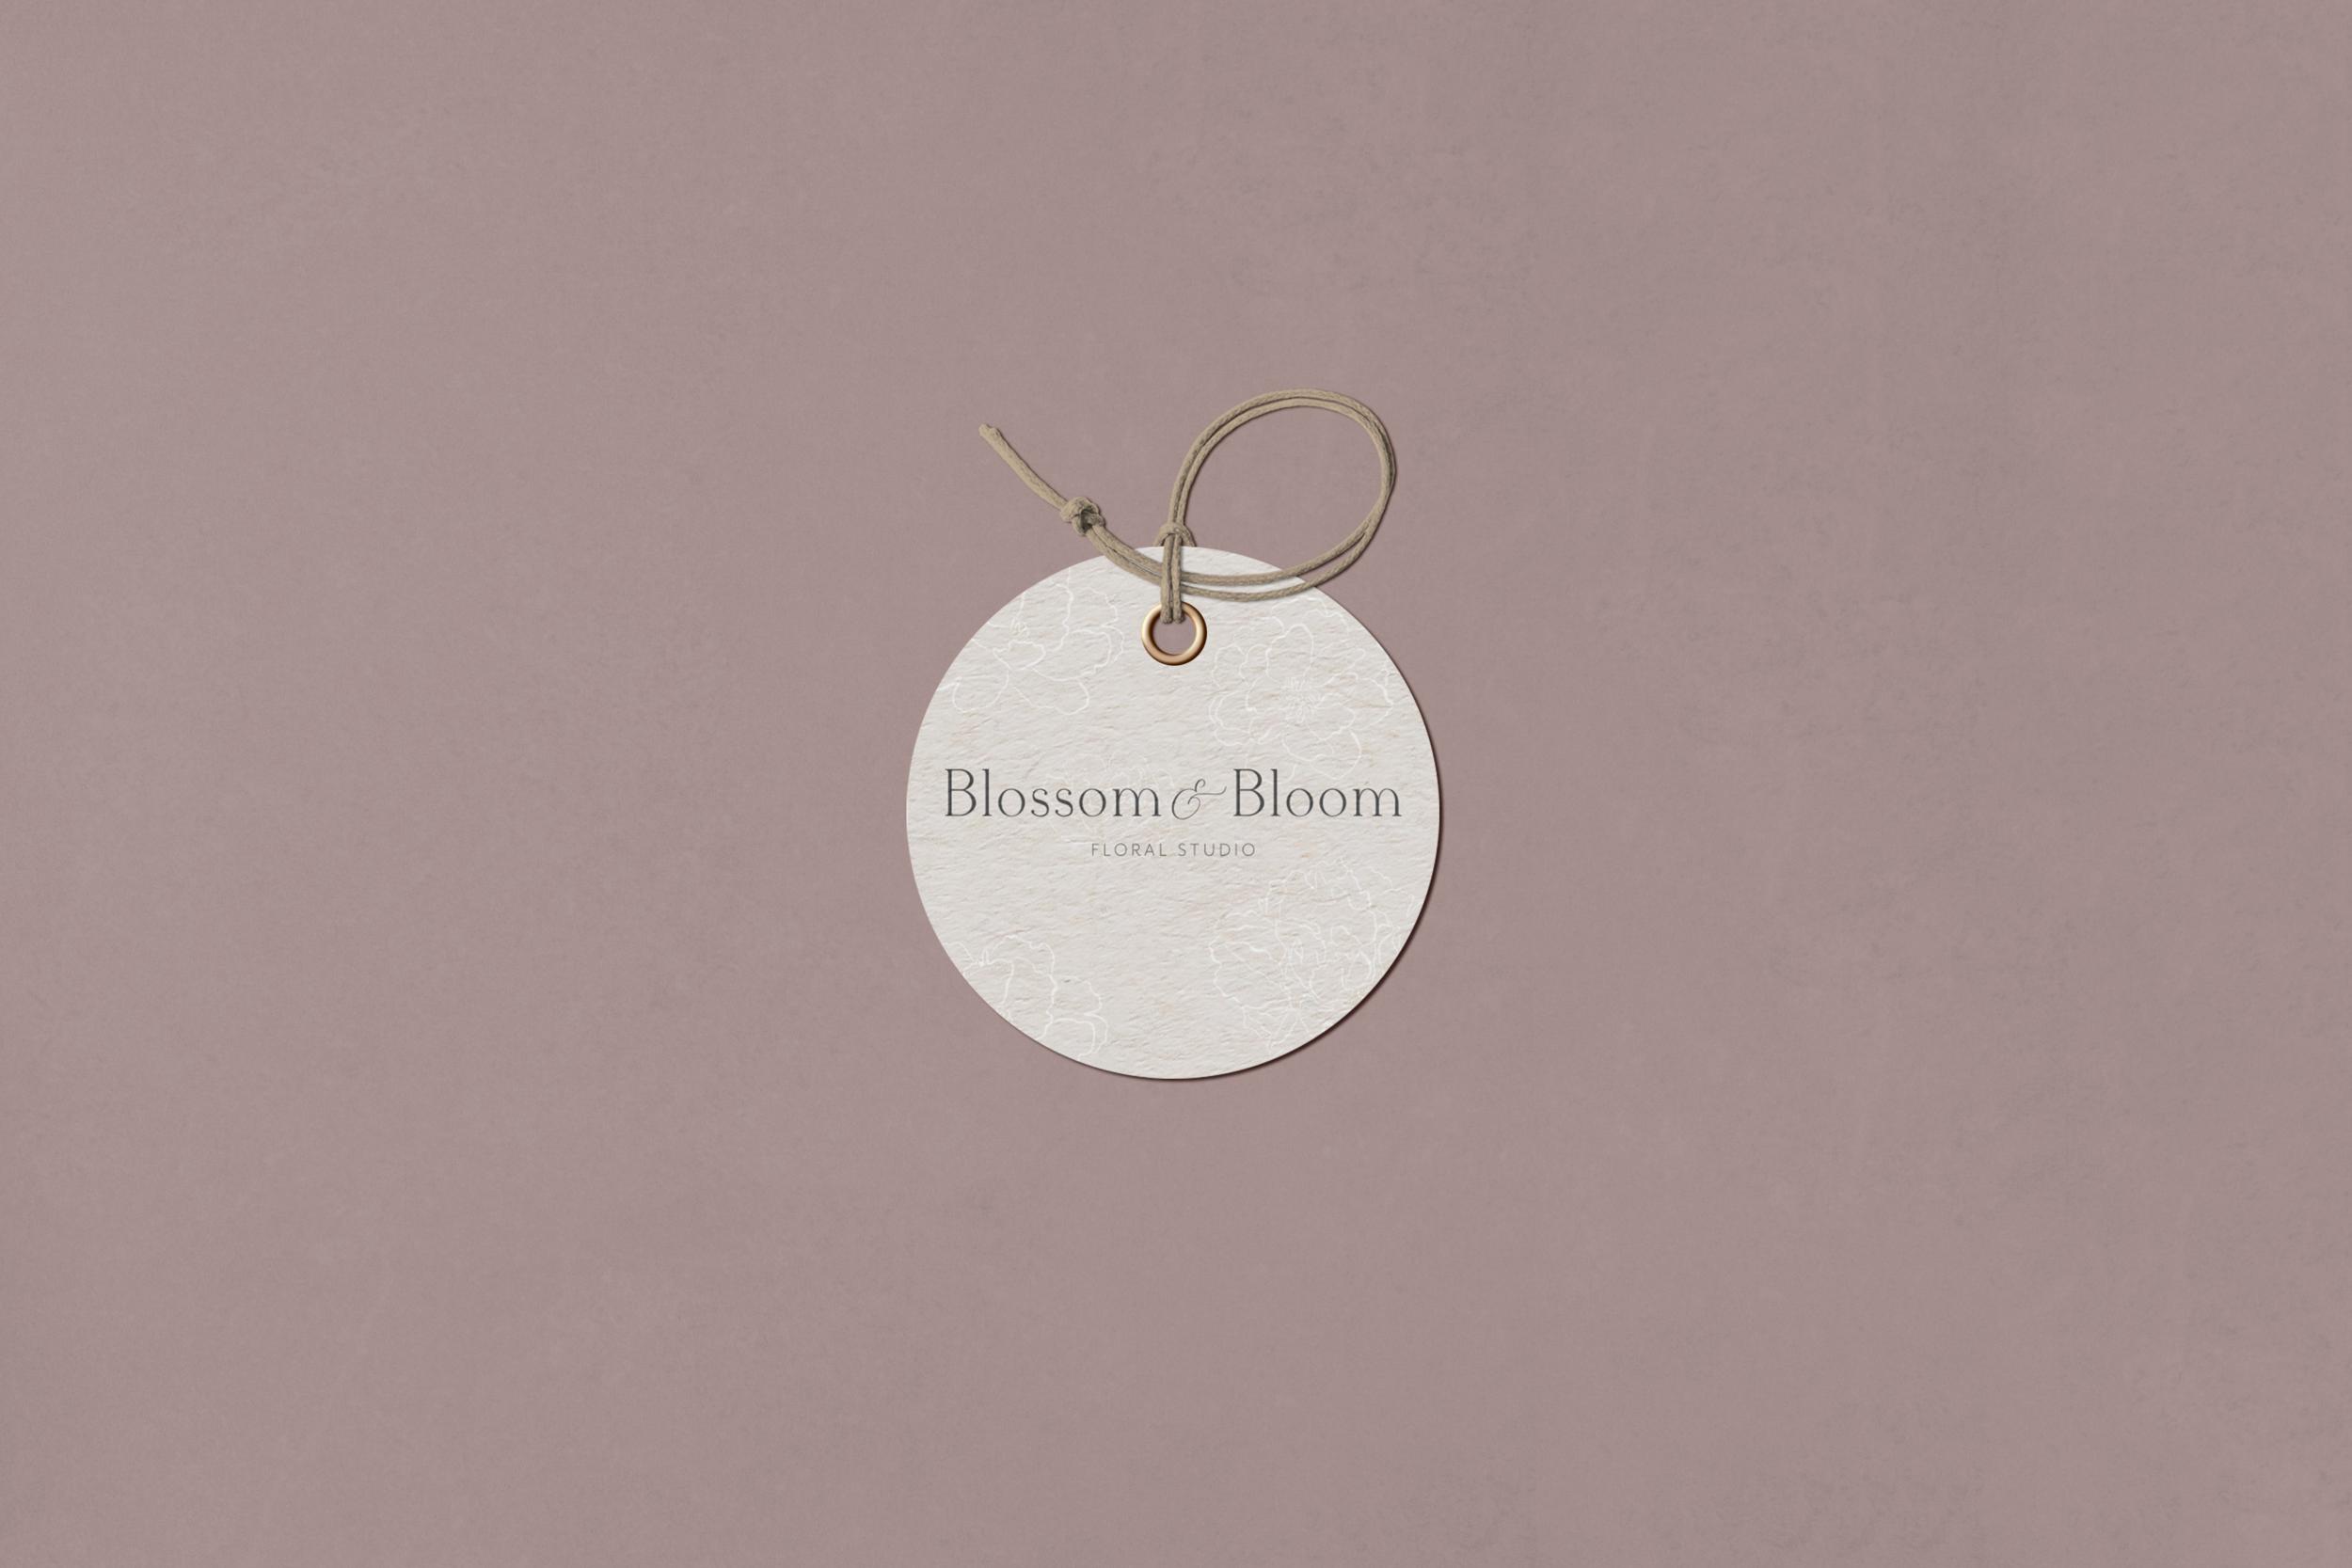 blossomandbloomtag.png